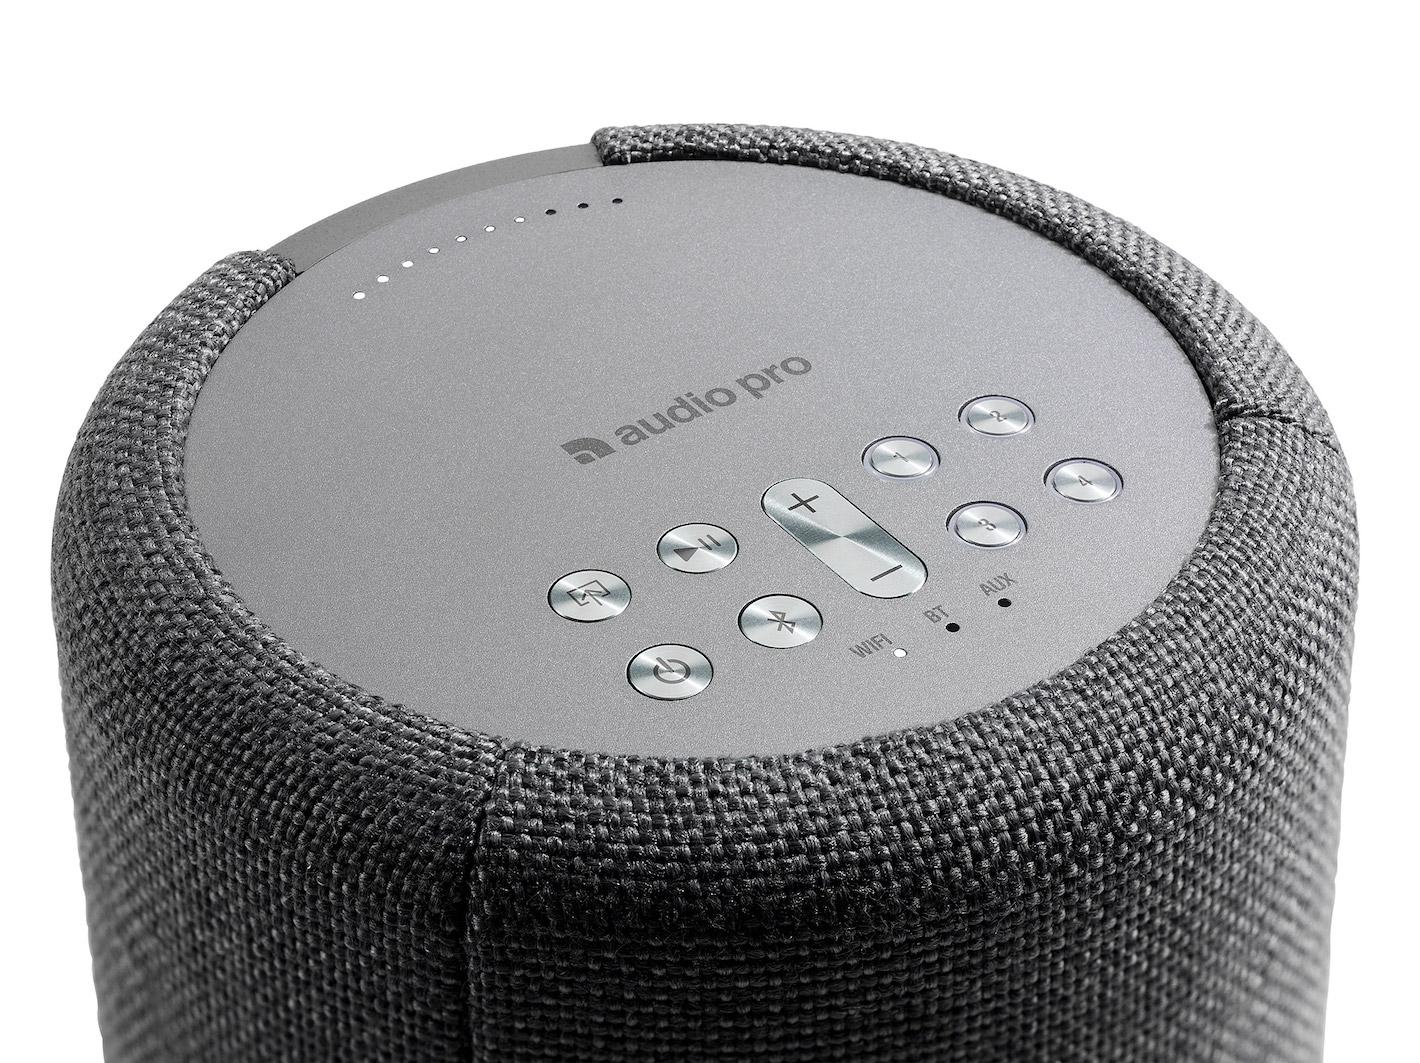 wireless-multiroom-speaker-A10-darkgray-detail-works-with-alexa-AudioPro